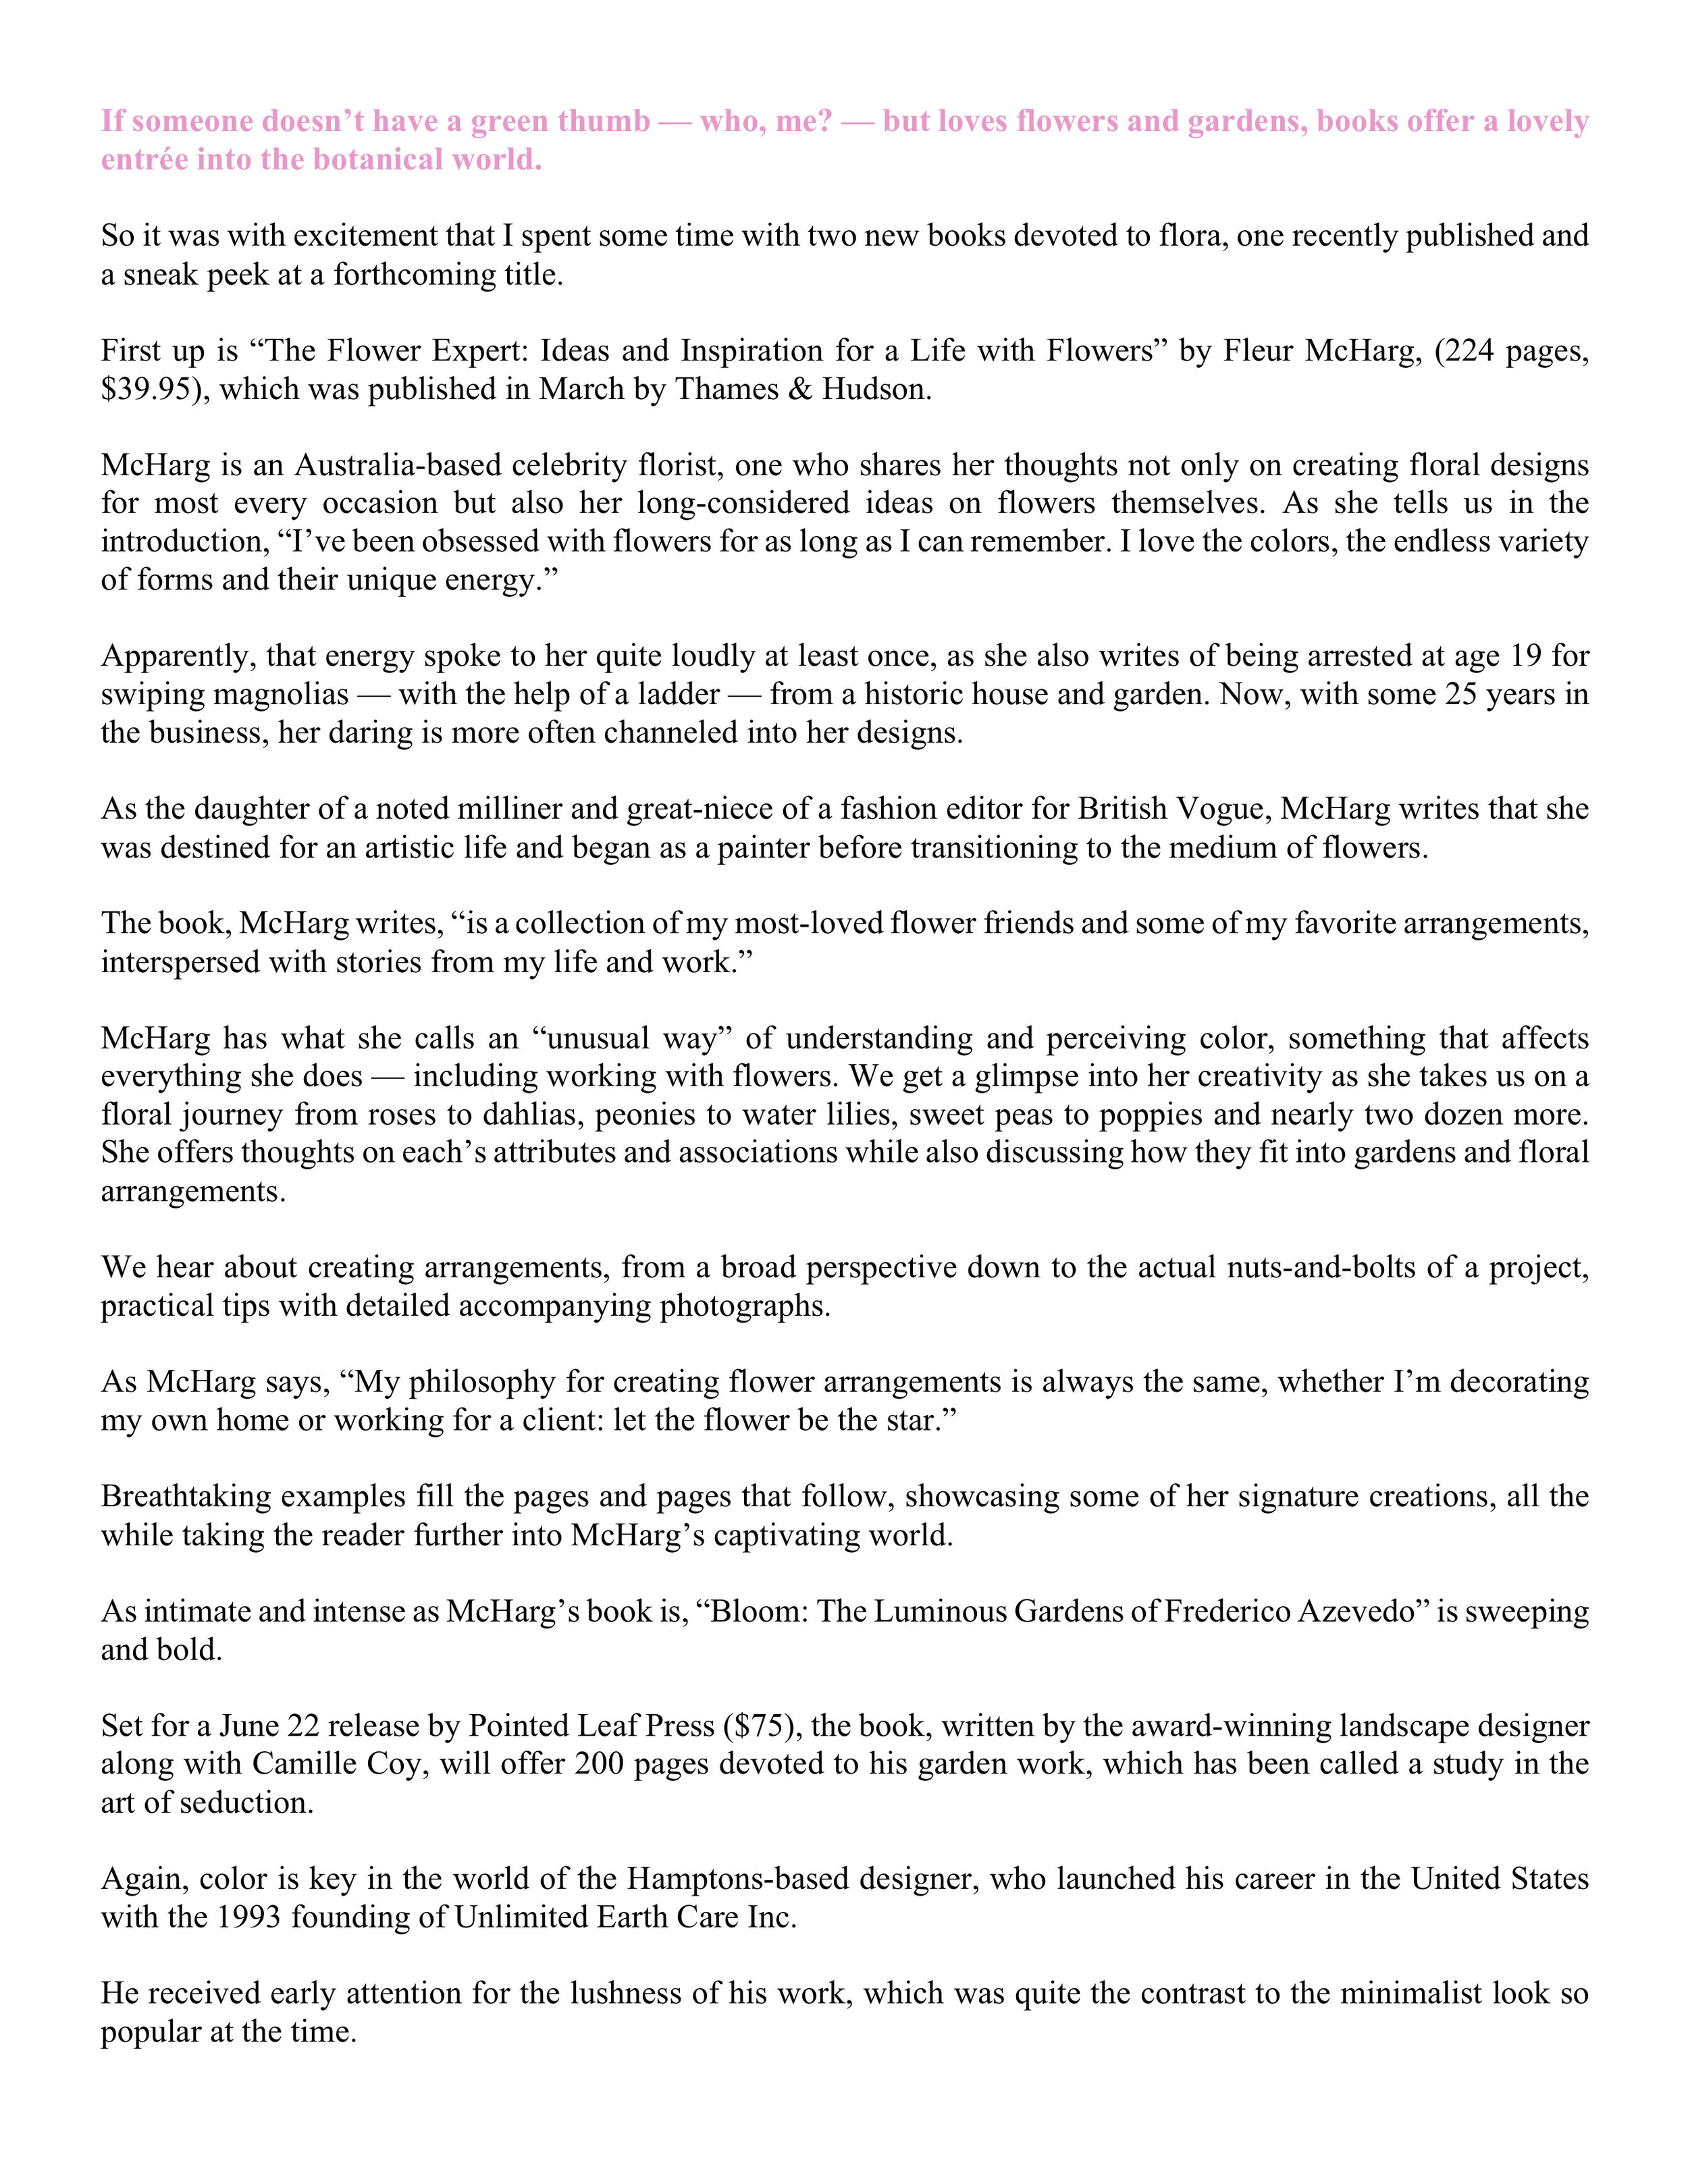 66 WAG - Petaling thru the pages - May1_2019_pg2.jpg